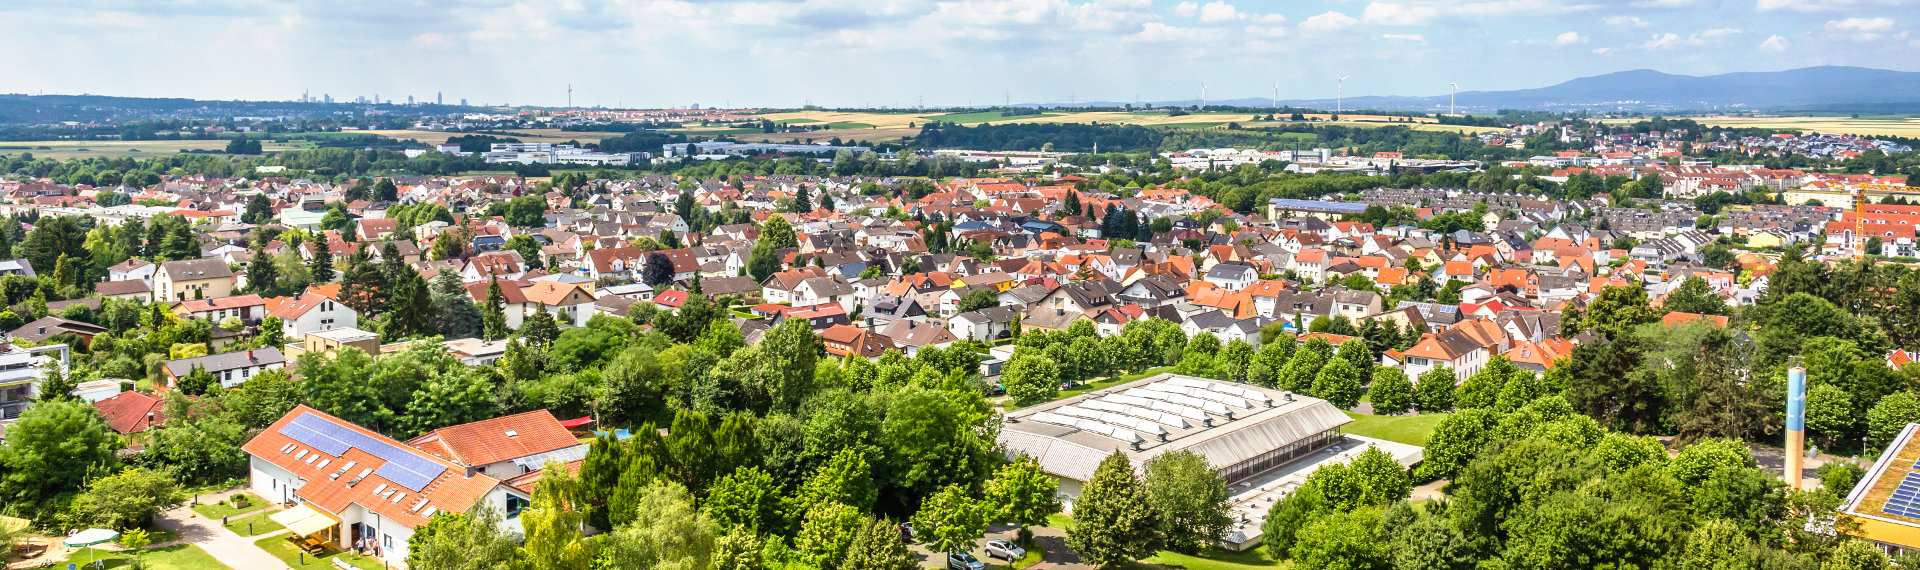 Luftbildaufnahme 3